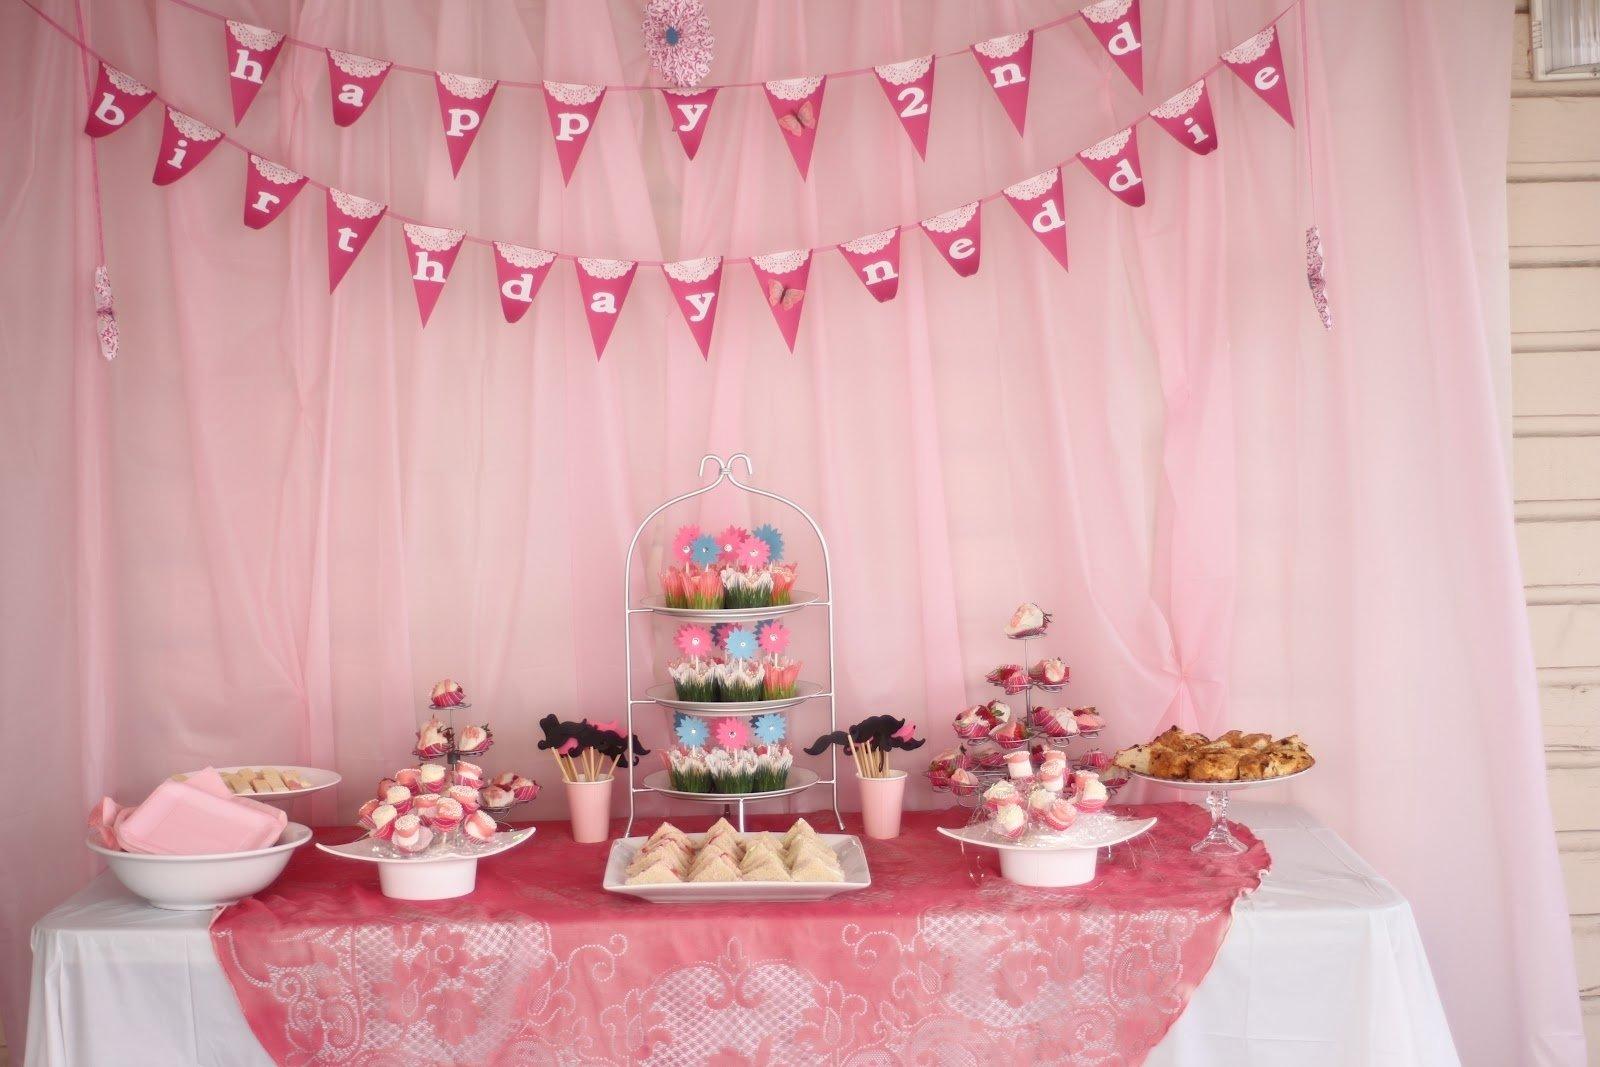 10 Great 2 Yr Old Birthday Party Ideas girl birthday party ideas for year olds home design ideas 7 2020